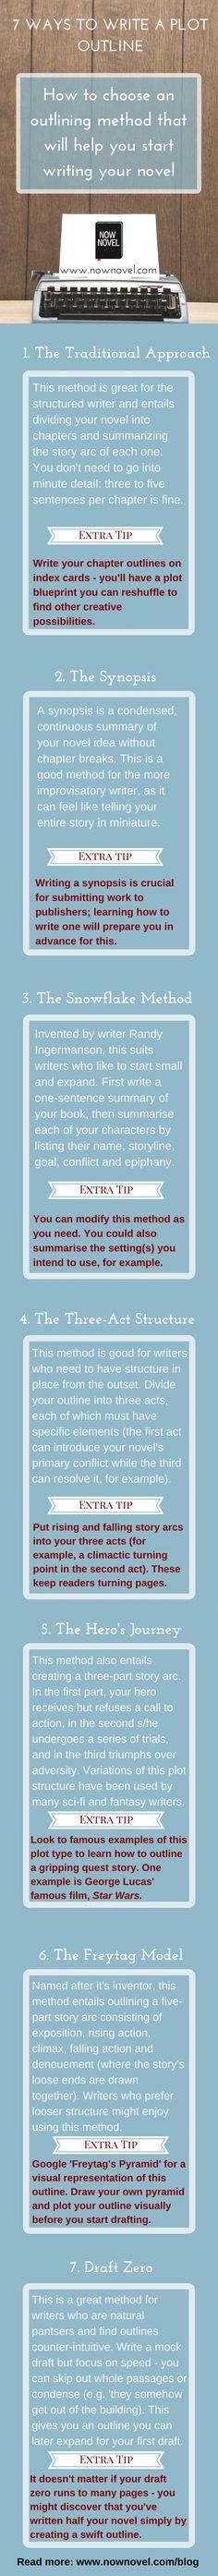 Take A Peak At Readers\u0027 and Writers\u0027 Shopping Lists Writing advice